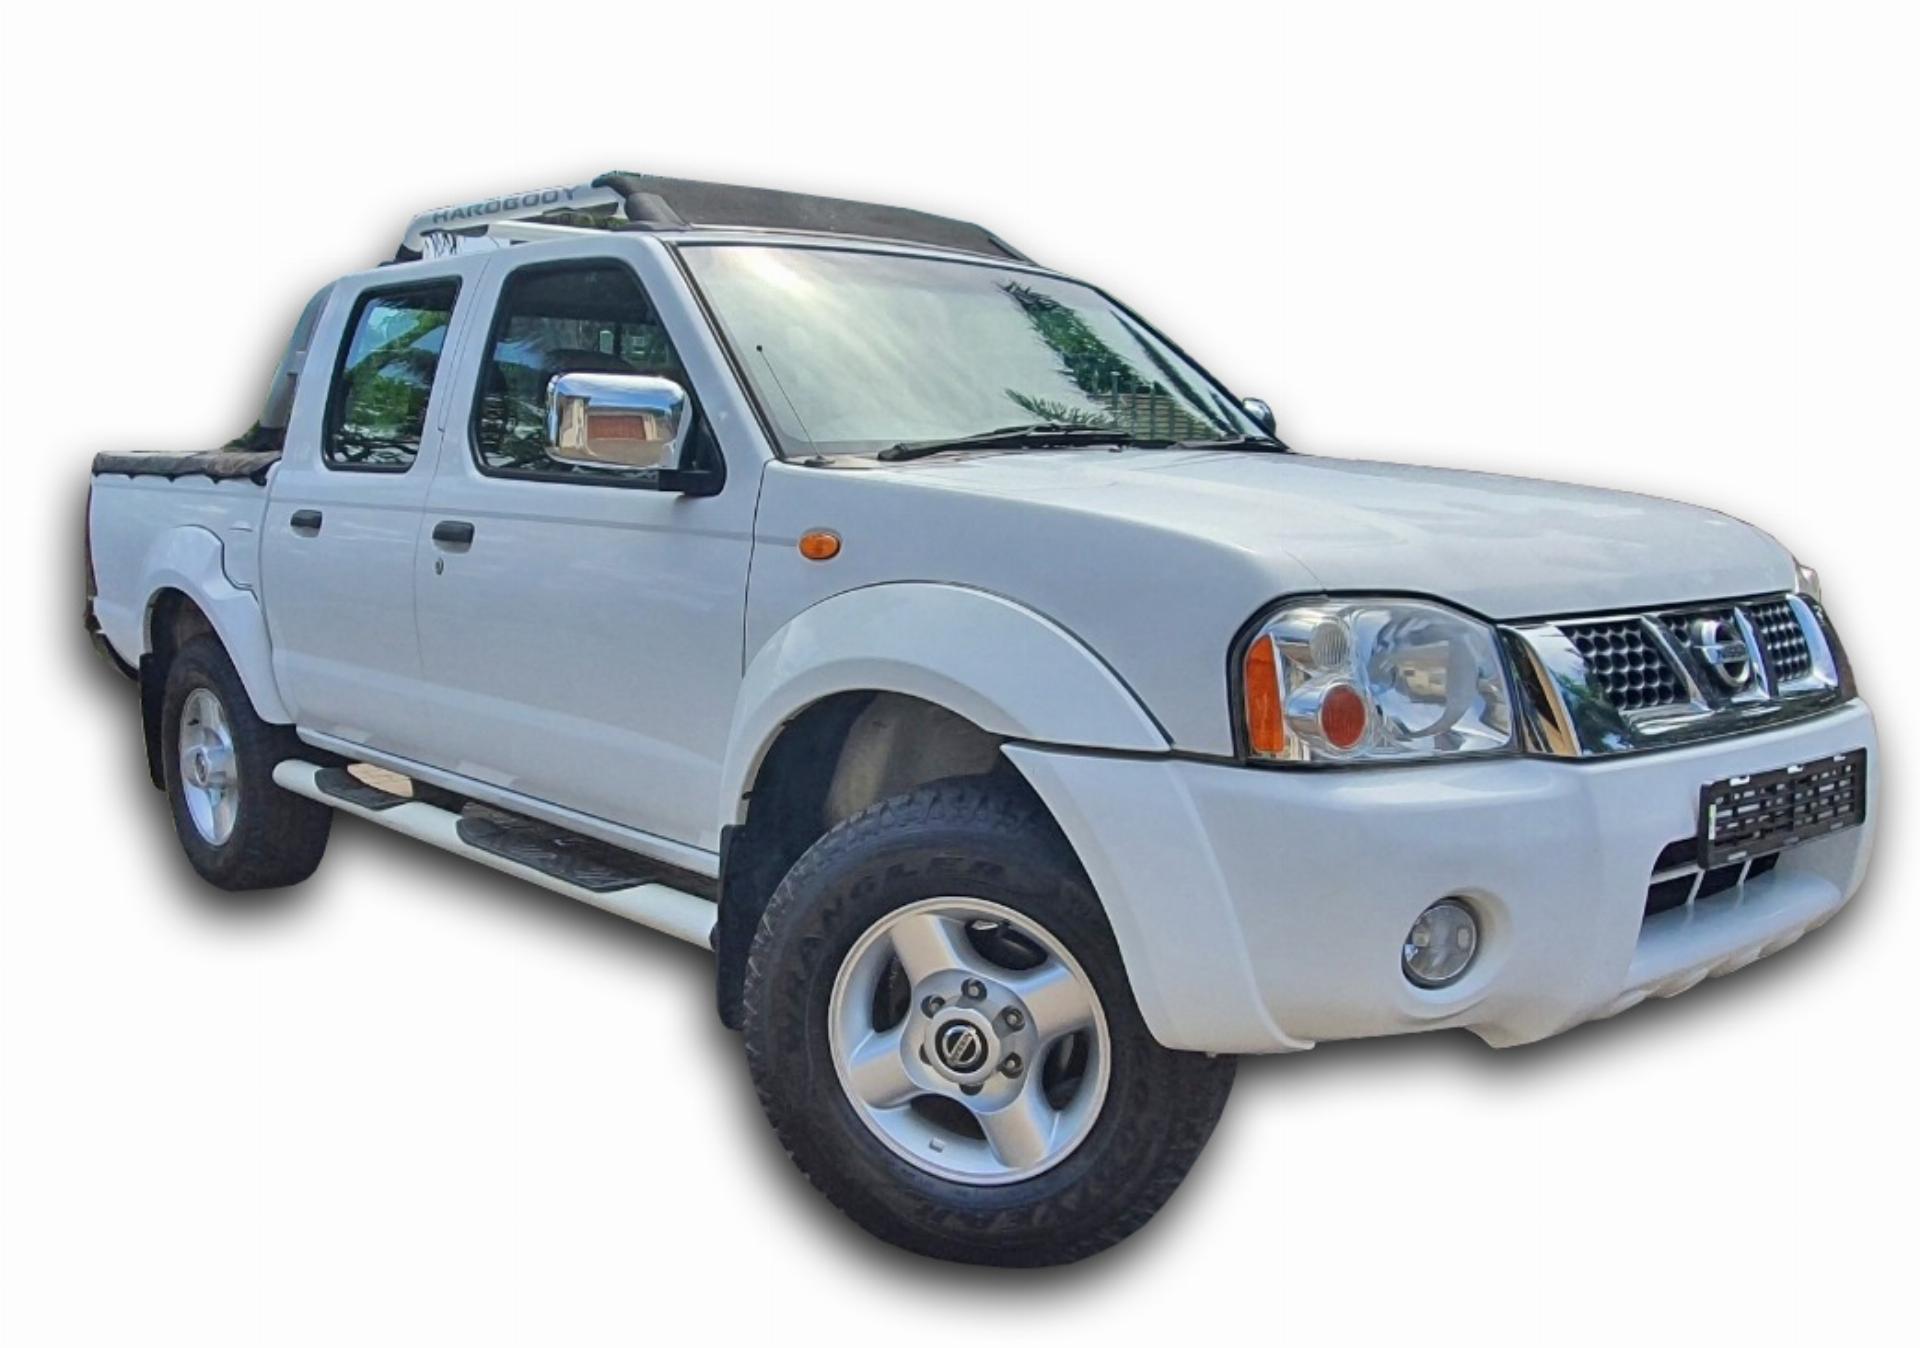 NP 300 Nissan Hardbody 2.4 SE